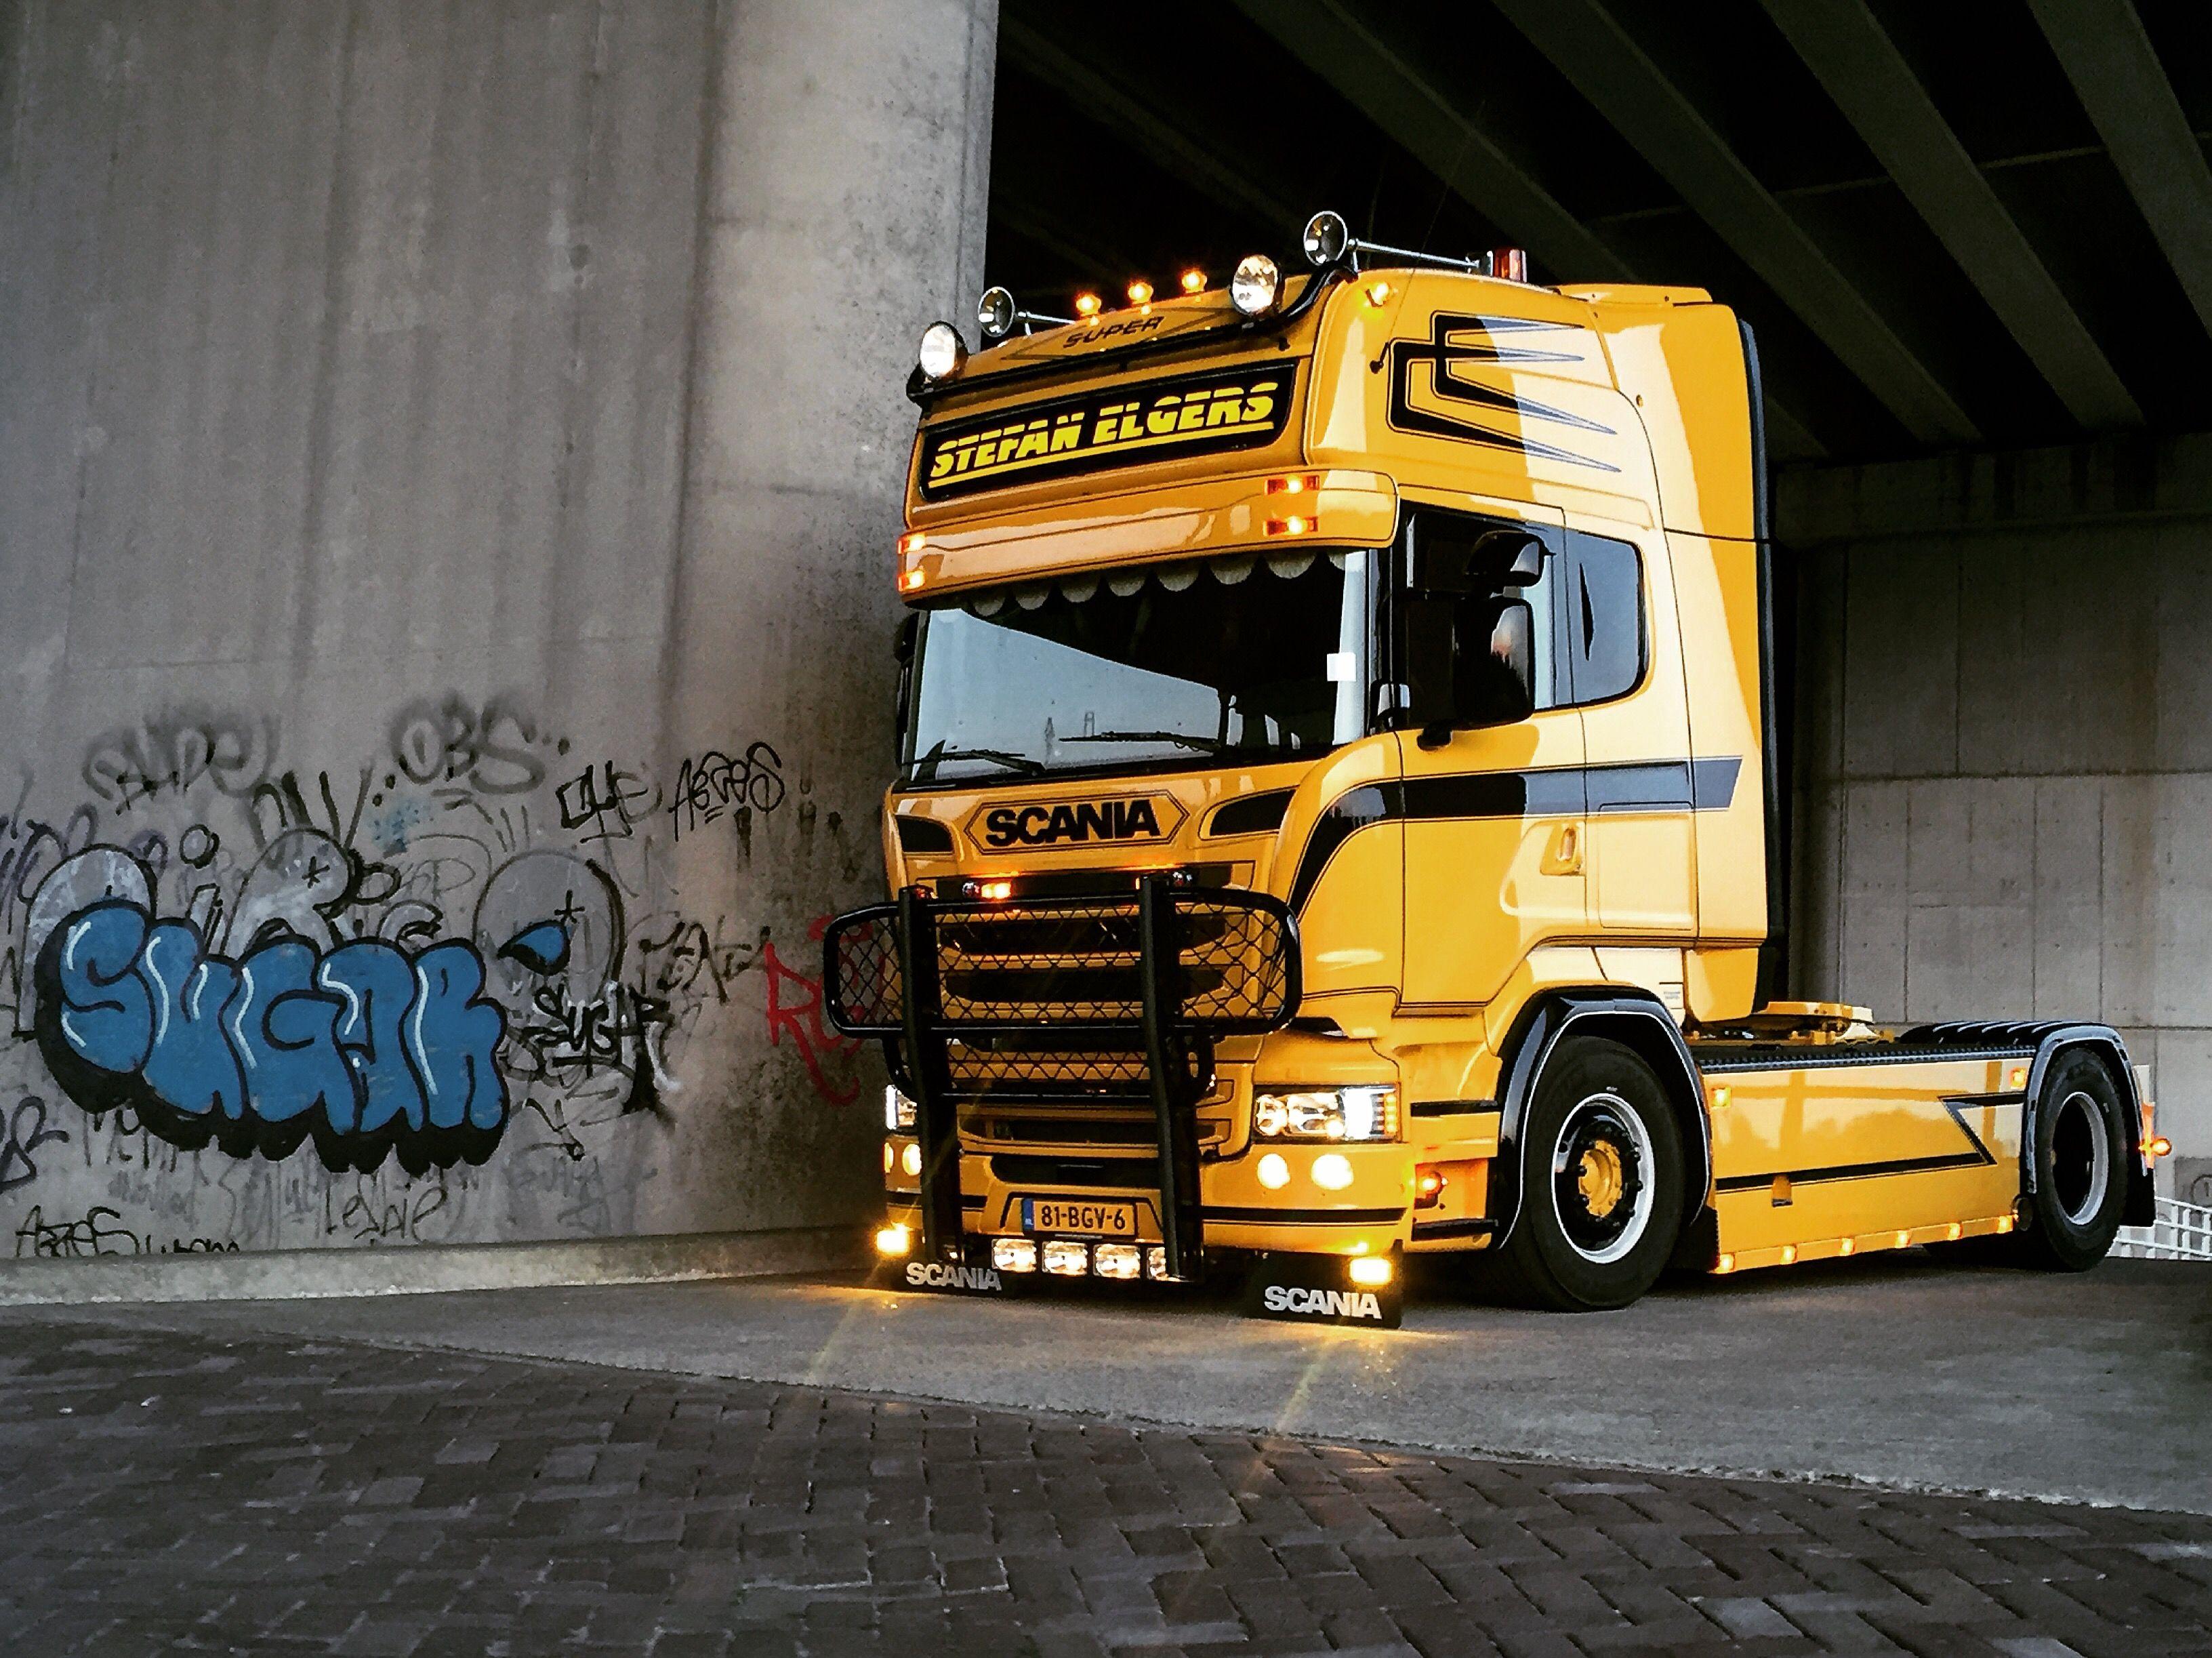 scania v8 r730 stefan elgers cars trucks pinterest semi trucks rigs and train truck. Black Bedroom Furniture Sets. Home Design Ideas